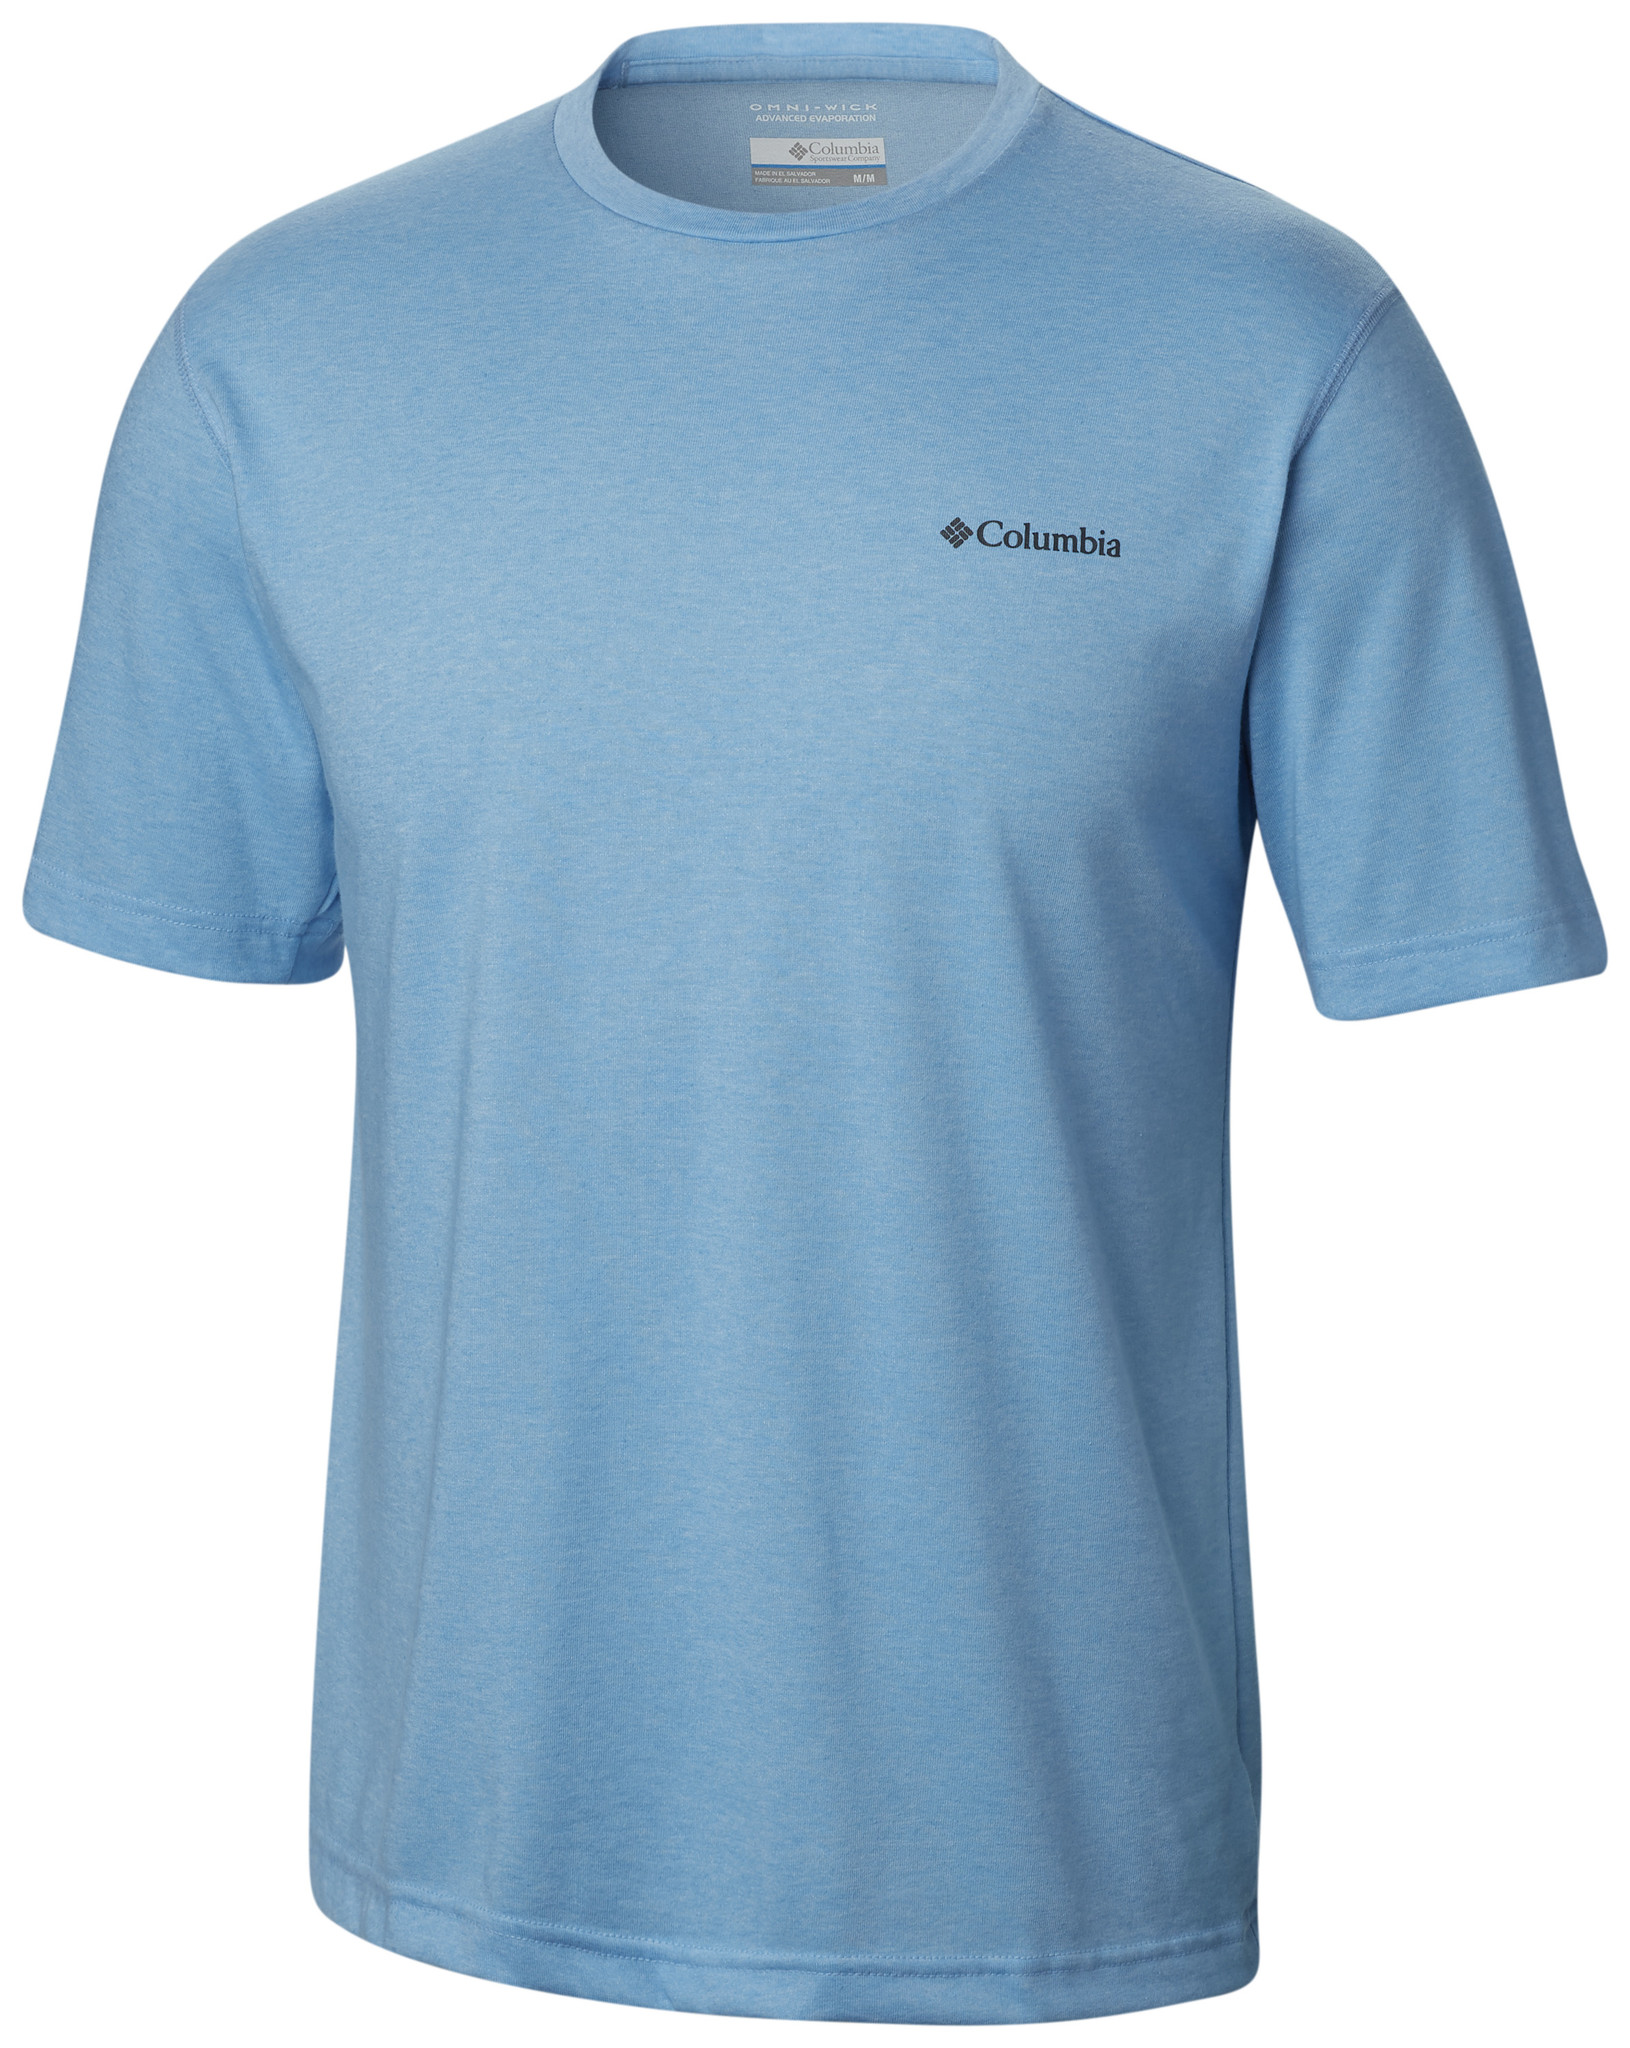 Columbia Sportswear Columbia Thistletown Park™ Crew